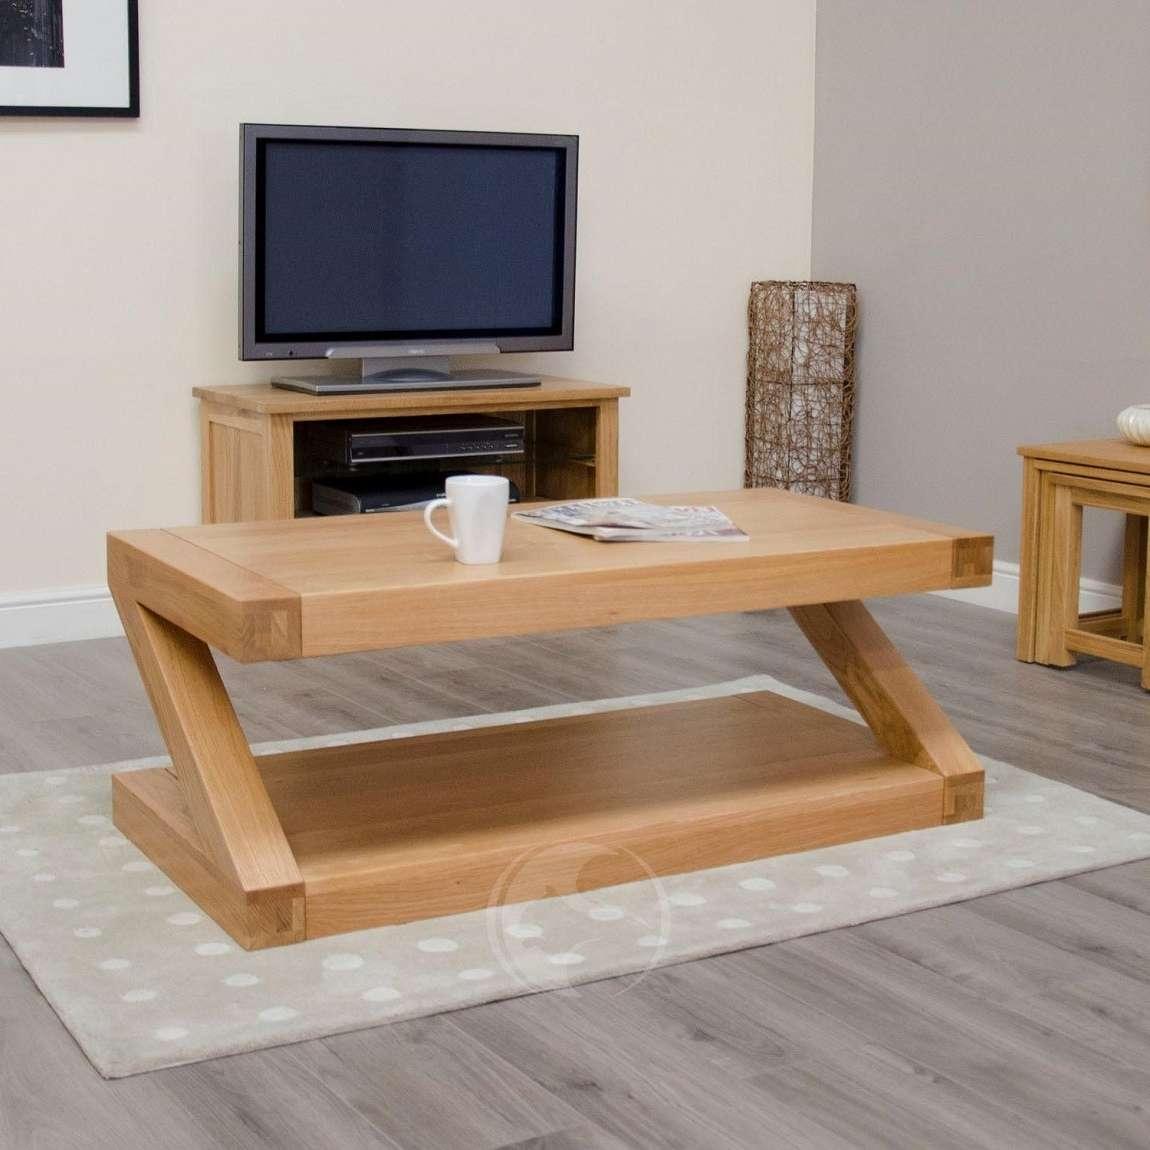 Oak Furniture Uk Inside Most Recent Oak Wood Coffee Tables (View 5 of 20)